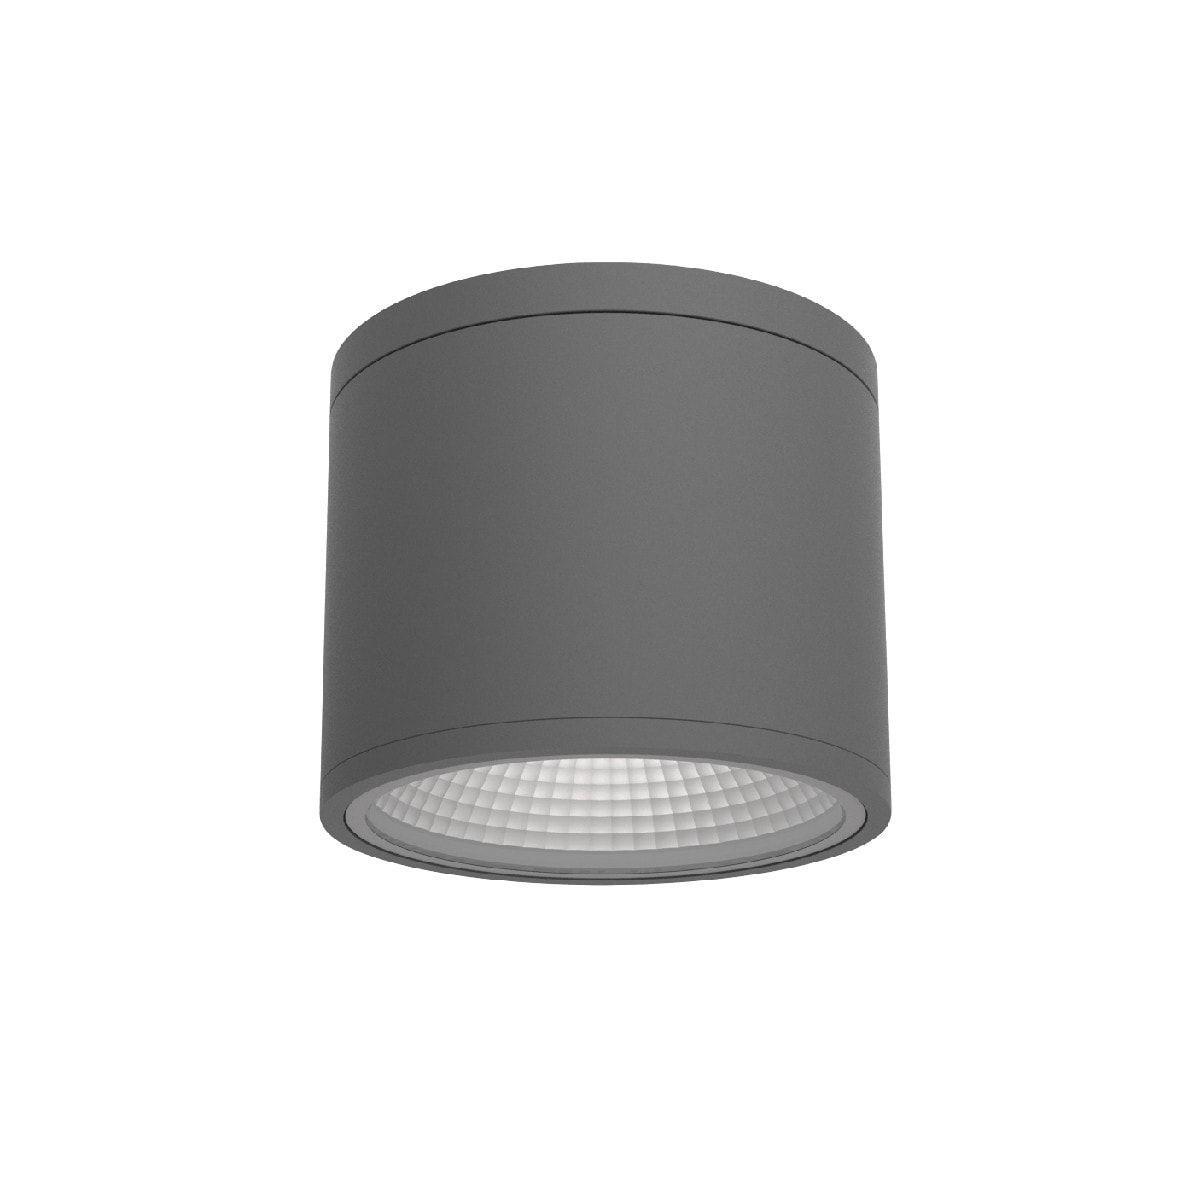 Indirekte Beleuchtung Selber Bauen Anleitung Esszimmer Lampe Led Modern Indirekte Deck Indirekte Beleuchtung Indirekte Beleuchtung Selber Bauen Beleuchtung